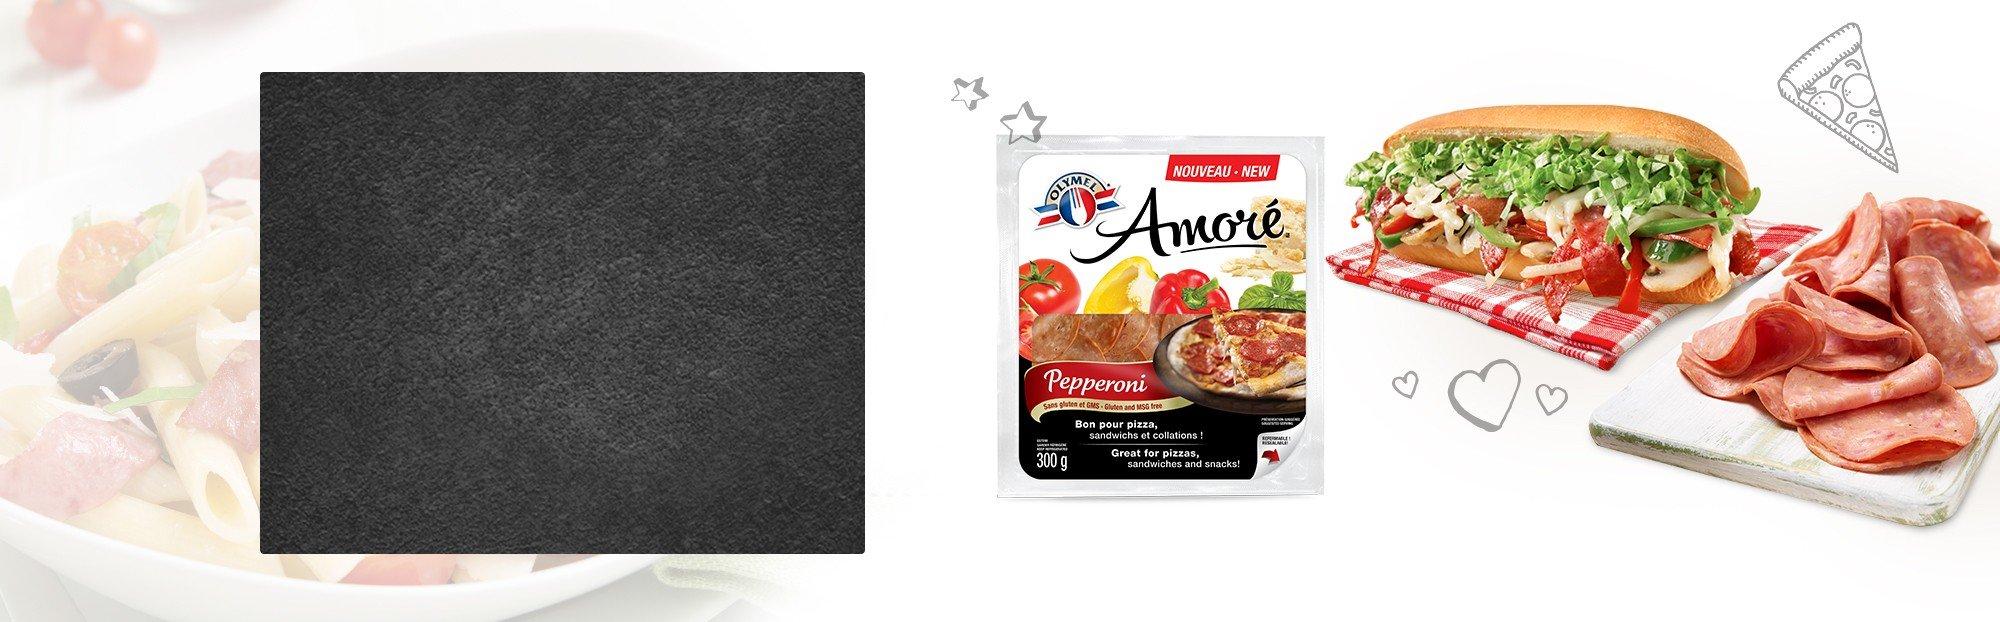 Pepperoni Amoré